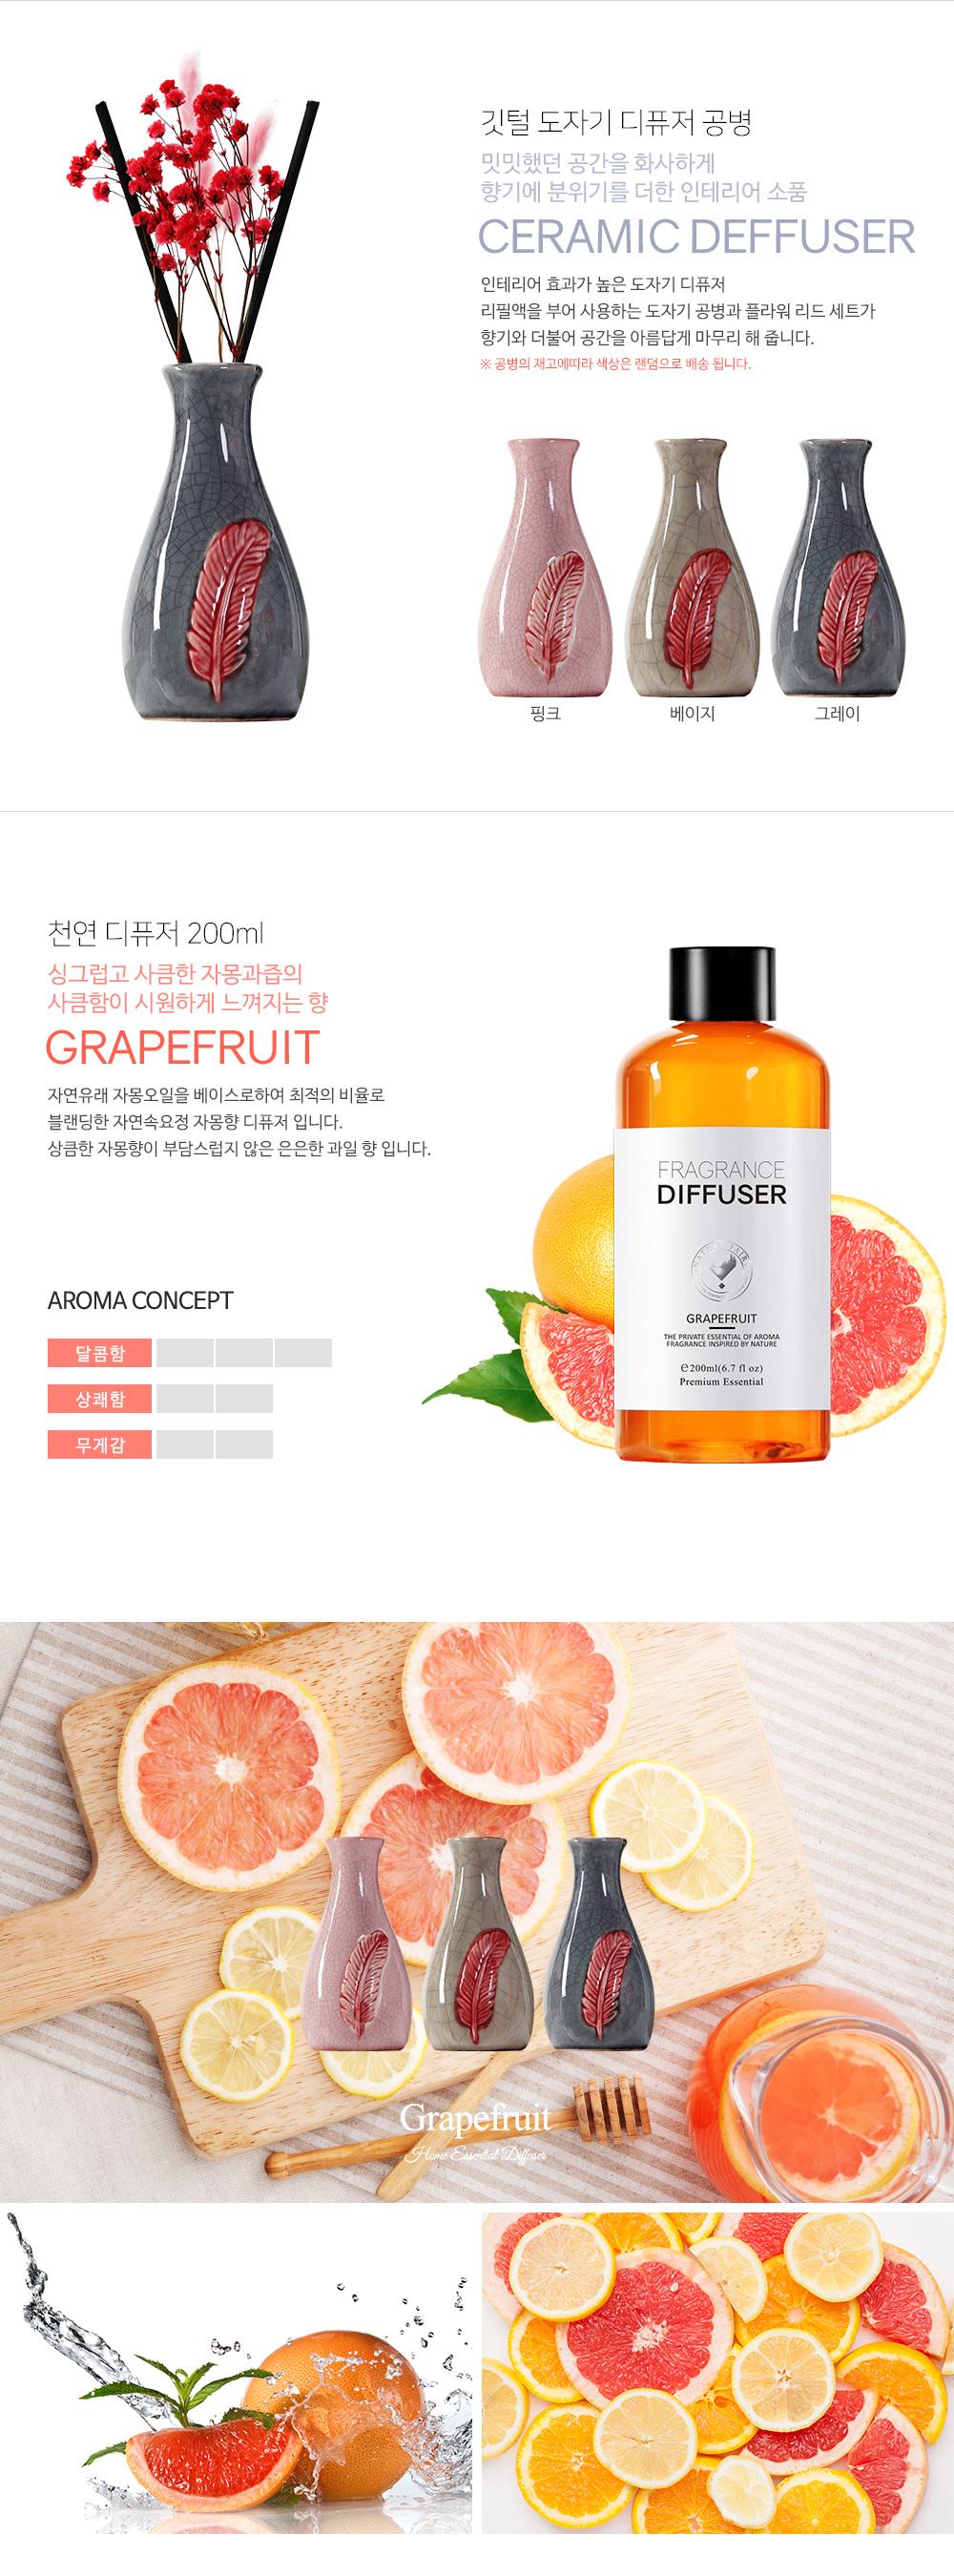 setDiffuser-ceramic_grapefruit_02.jpg